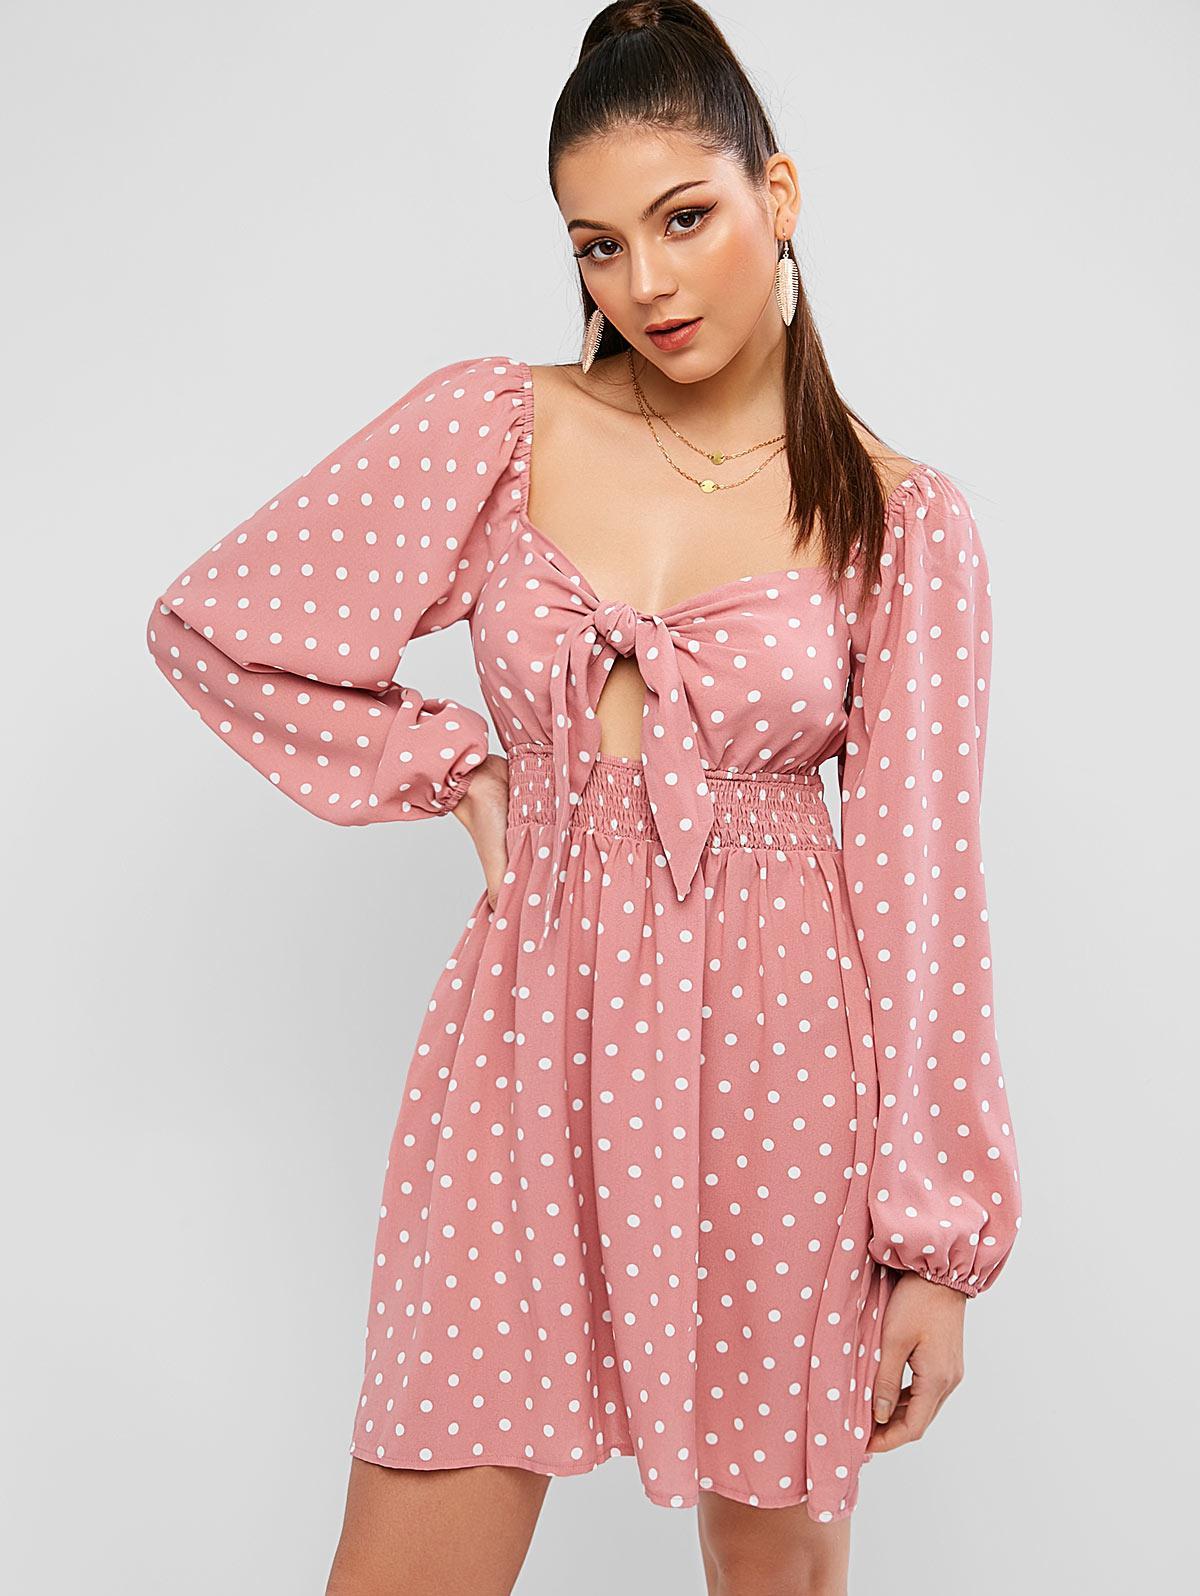 ZAFUL Knot Shirred Waist Polka Dot Milkmaid Dress thumbnail